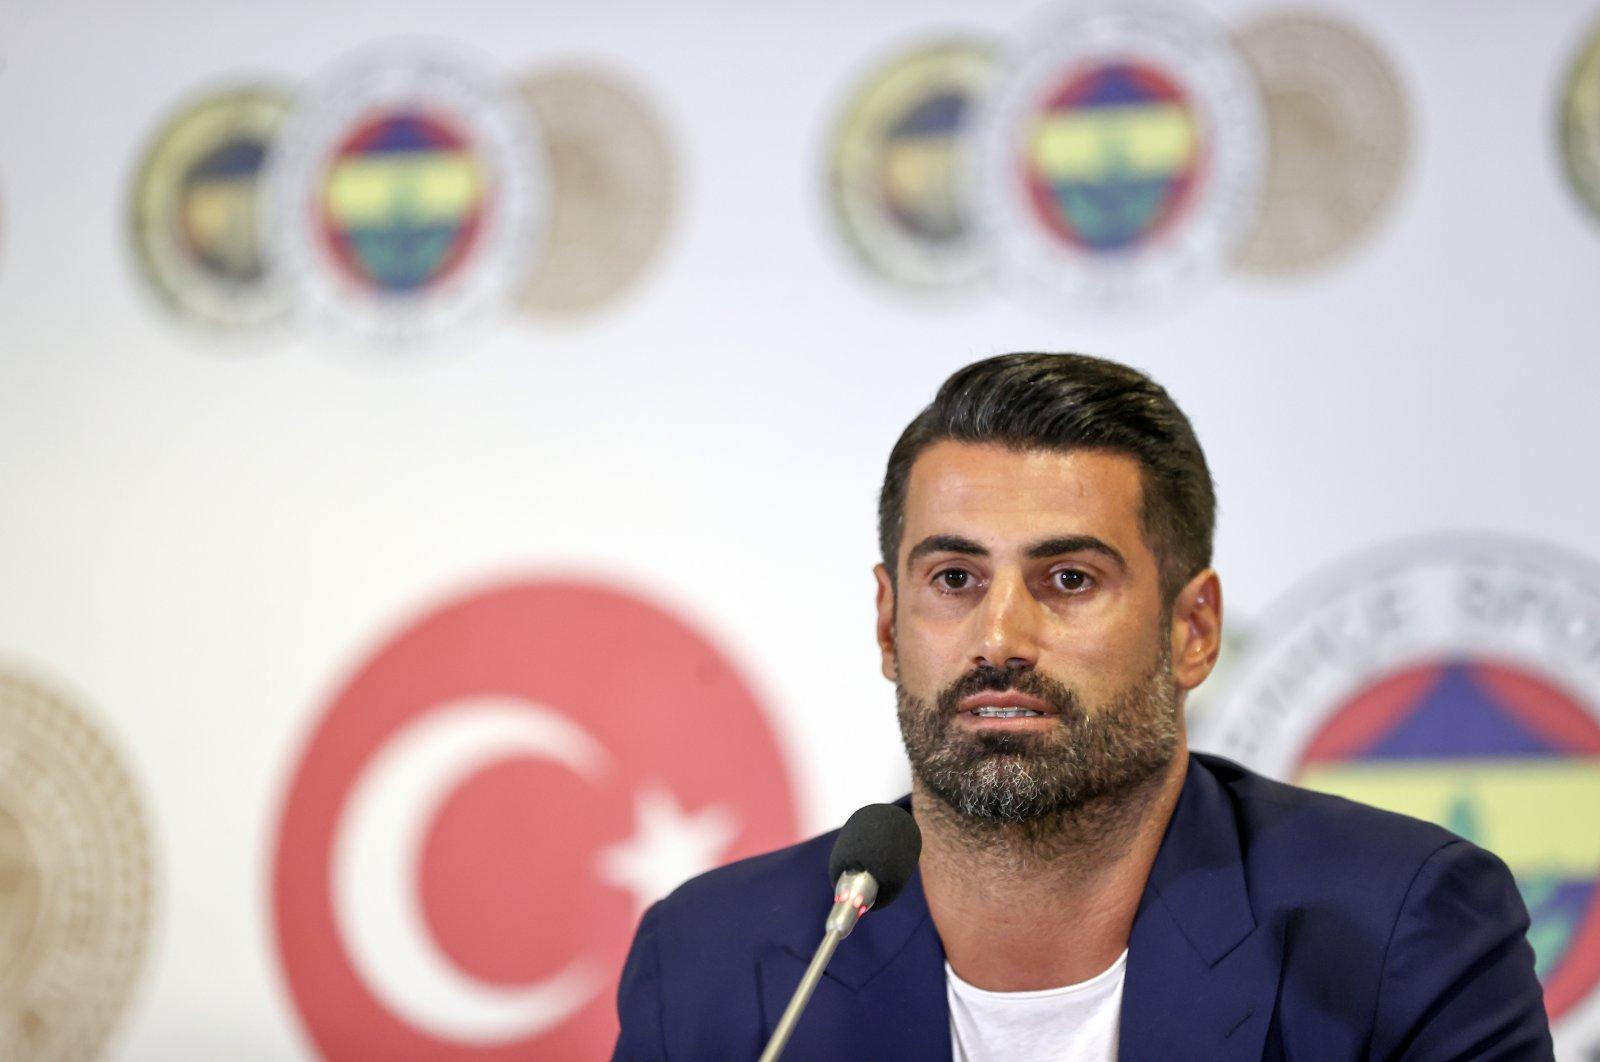 Longtime Fenerbahçe goalkeeper-turned assistant coach Volkan Demirel attends a press conference at Ülker Stadium, Istanbul, Turkey, July 14, 2021. (AA Photo)